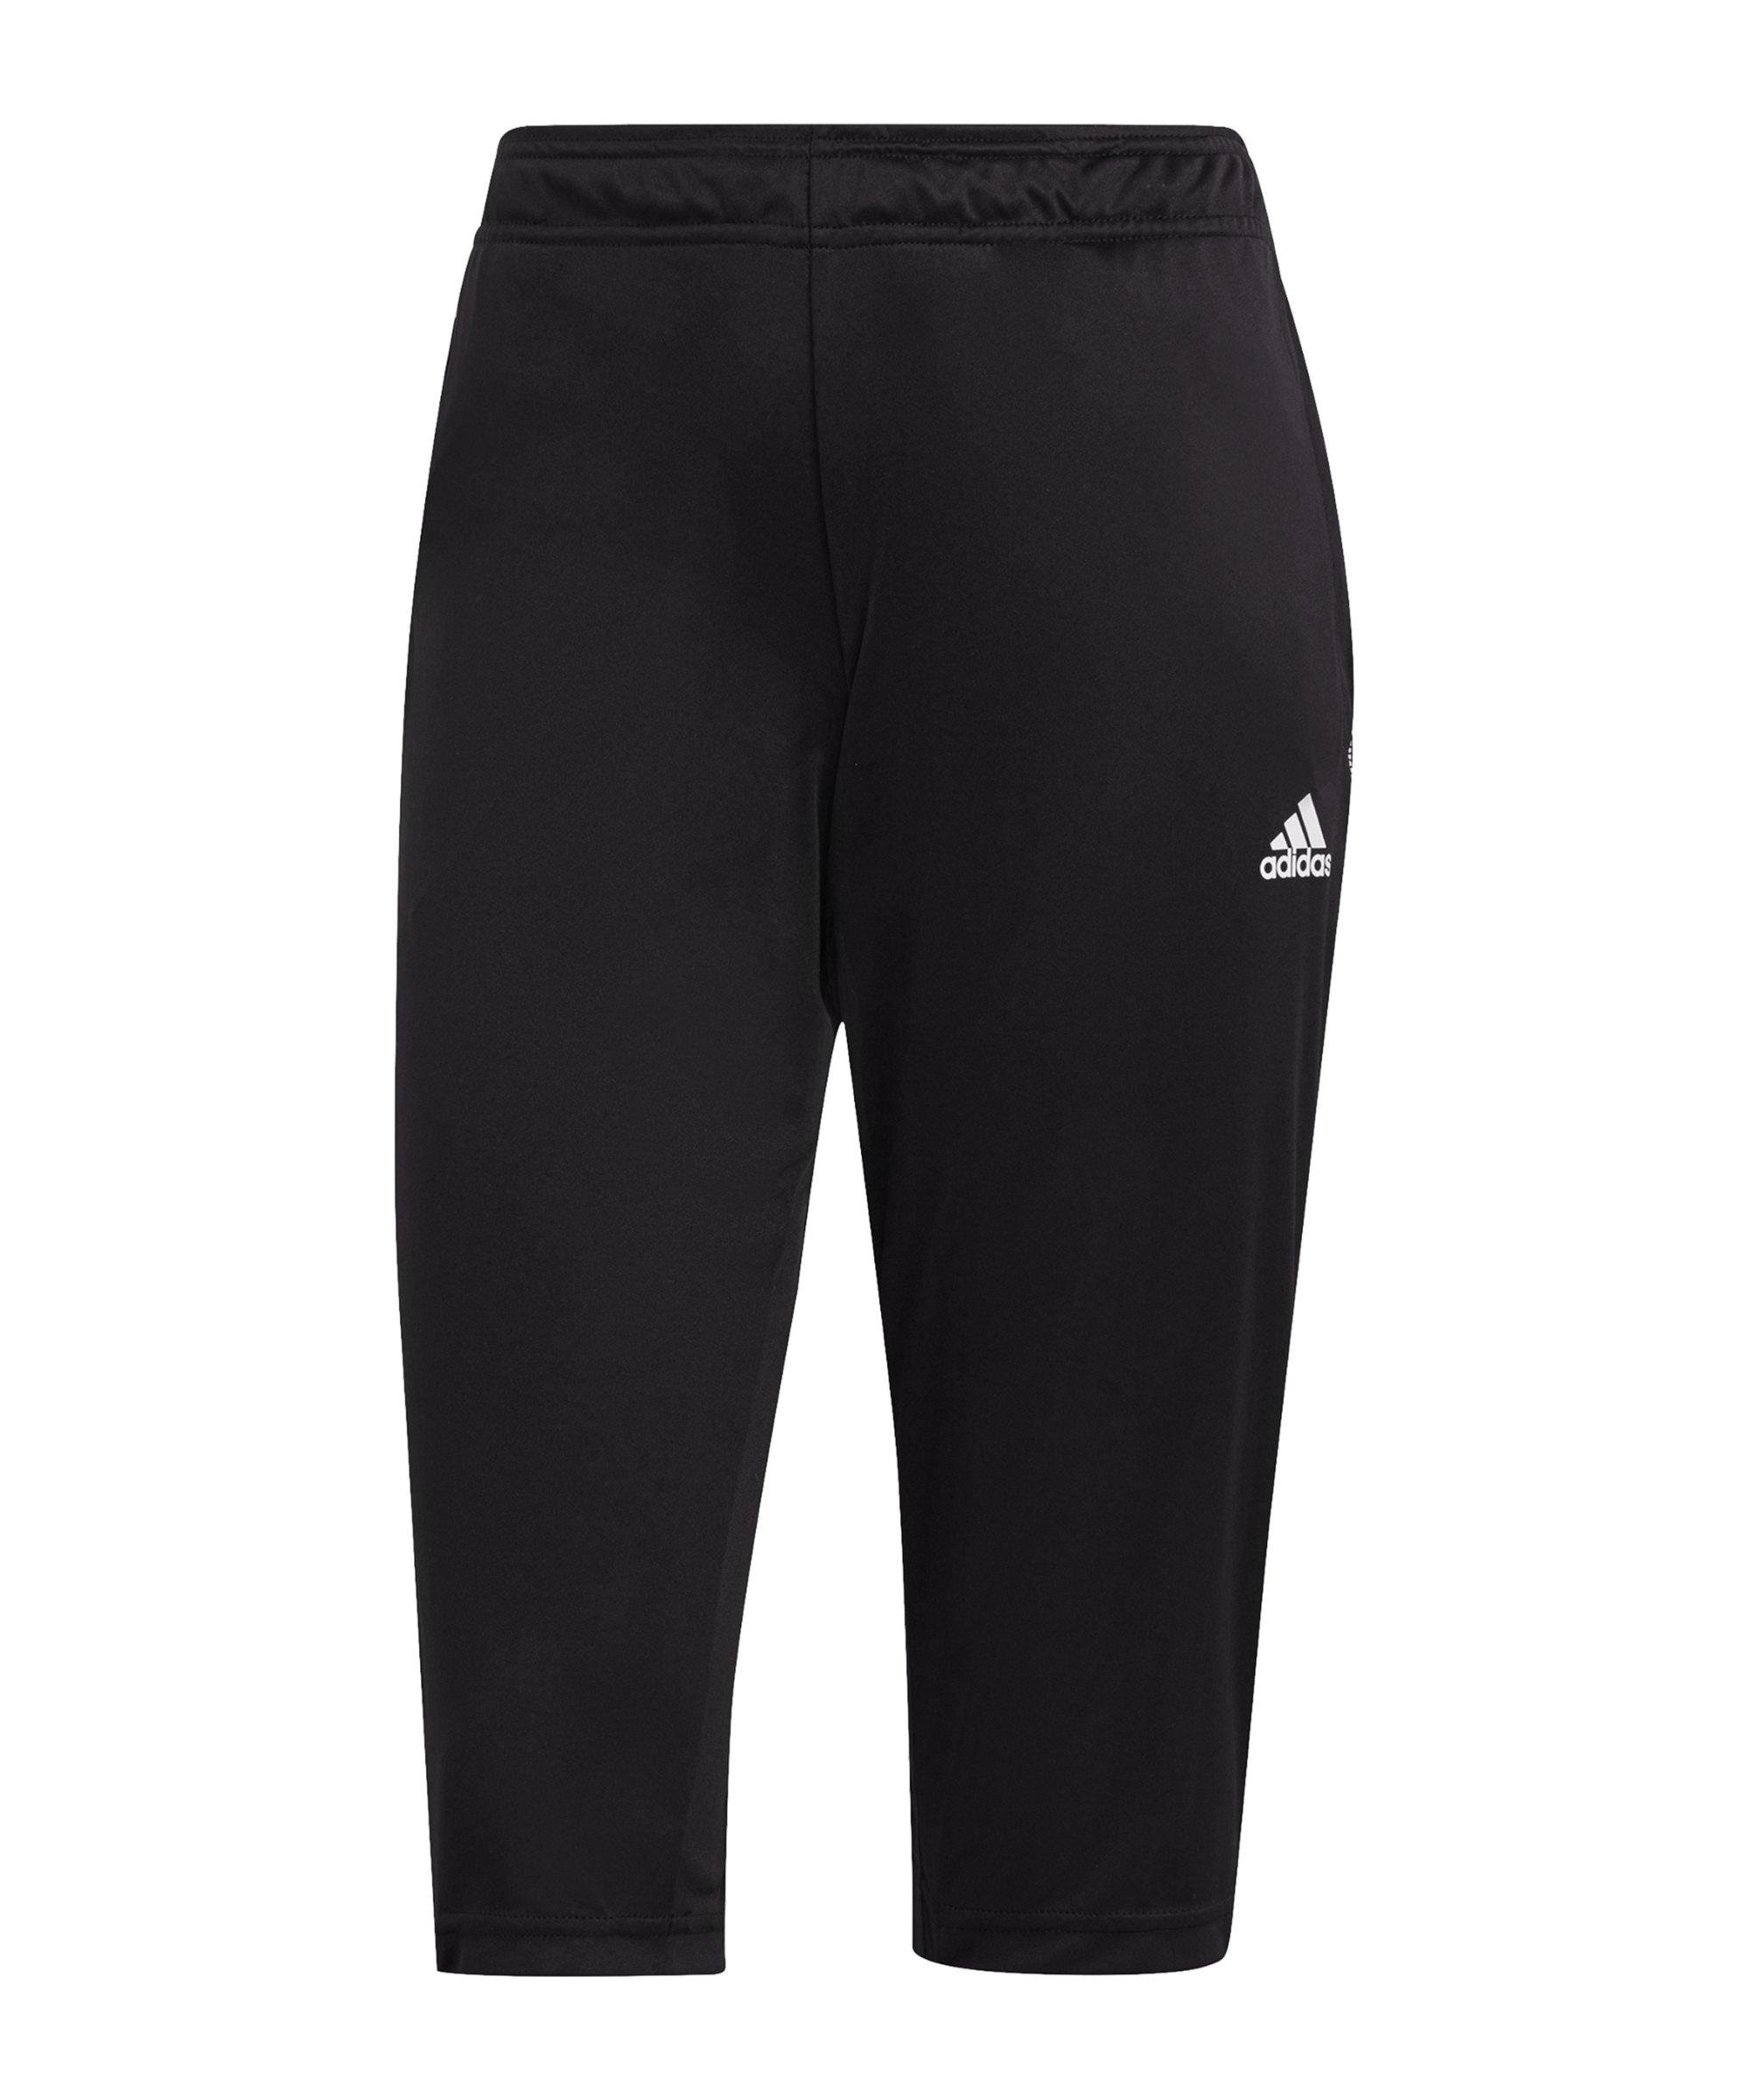 adidas Tiro 21 3/4 Trainingshose Damen Schwarz - schwarz